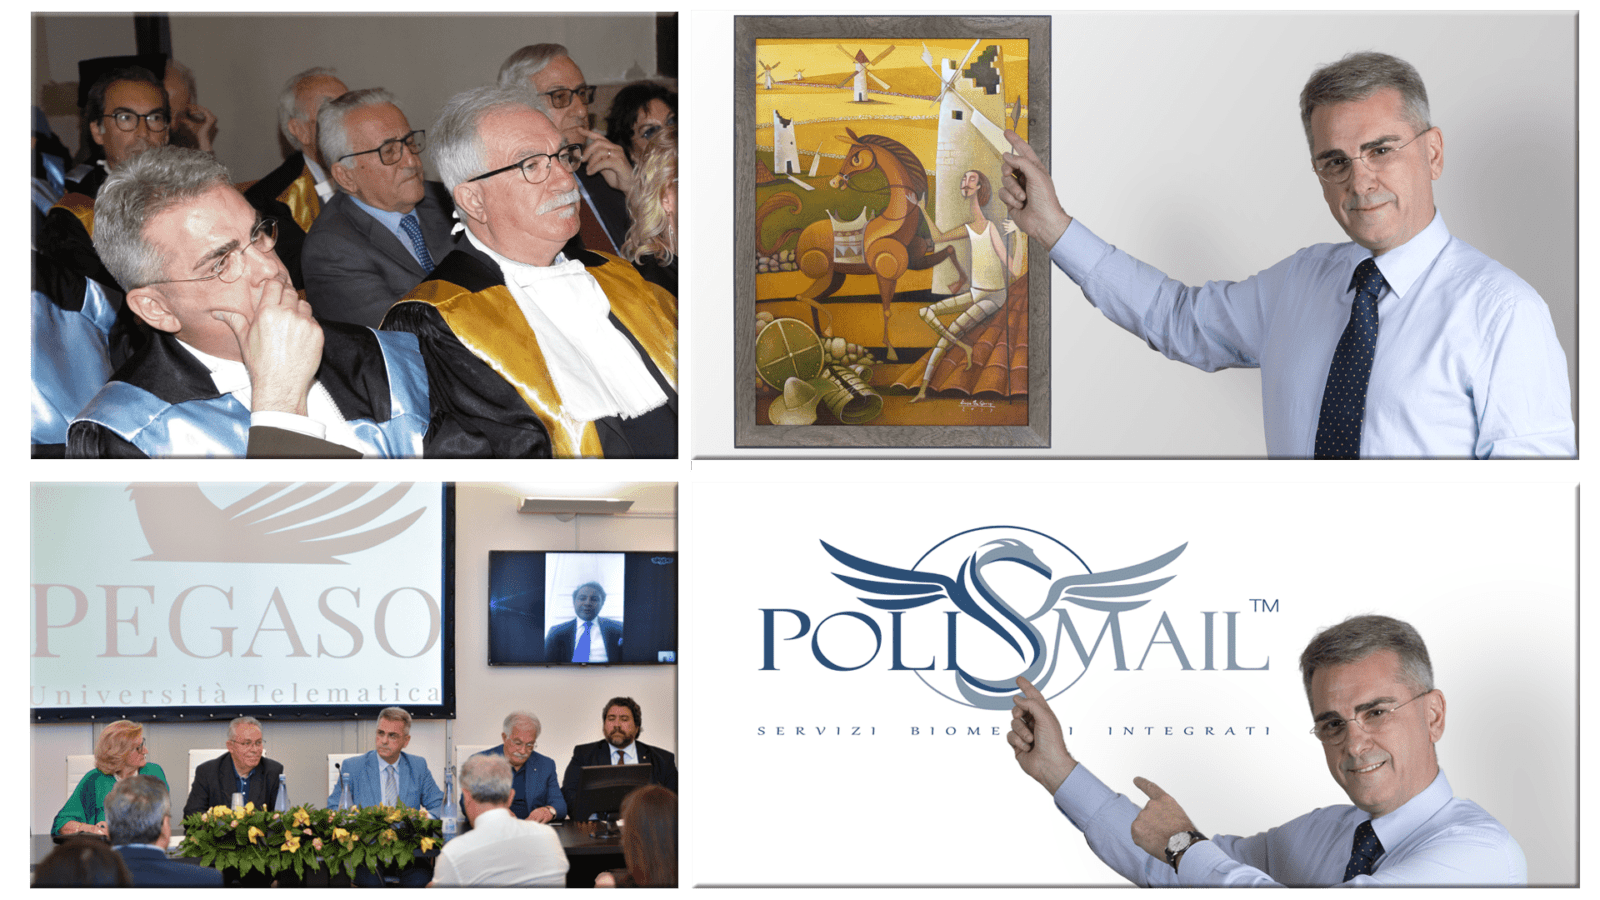 Mauro Minelli Polismail, Pegaso, Don chisciotte